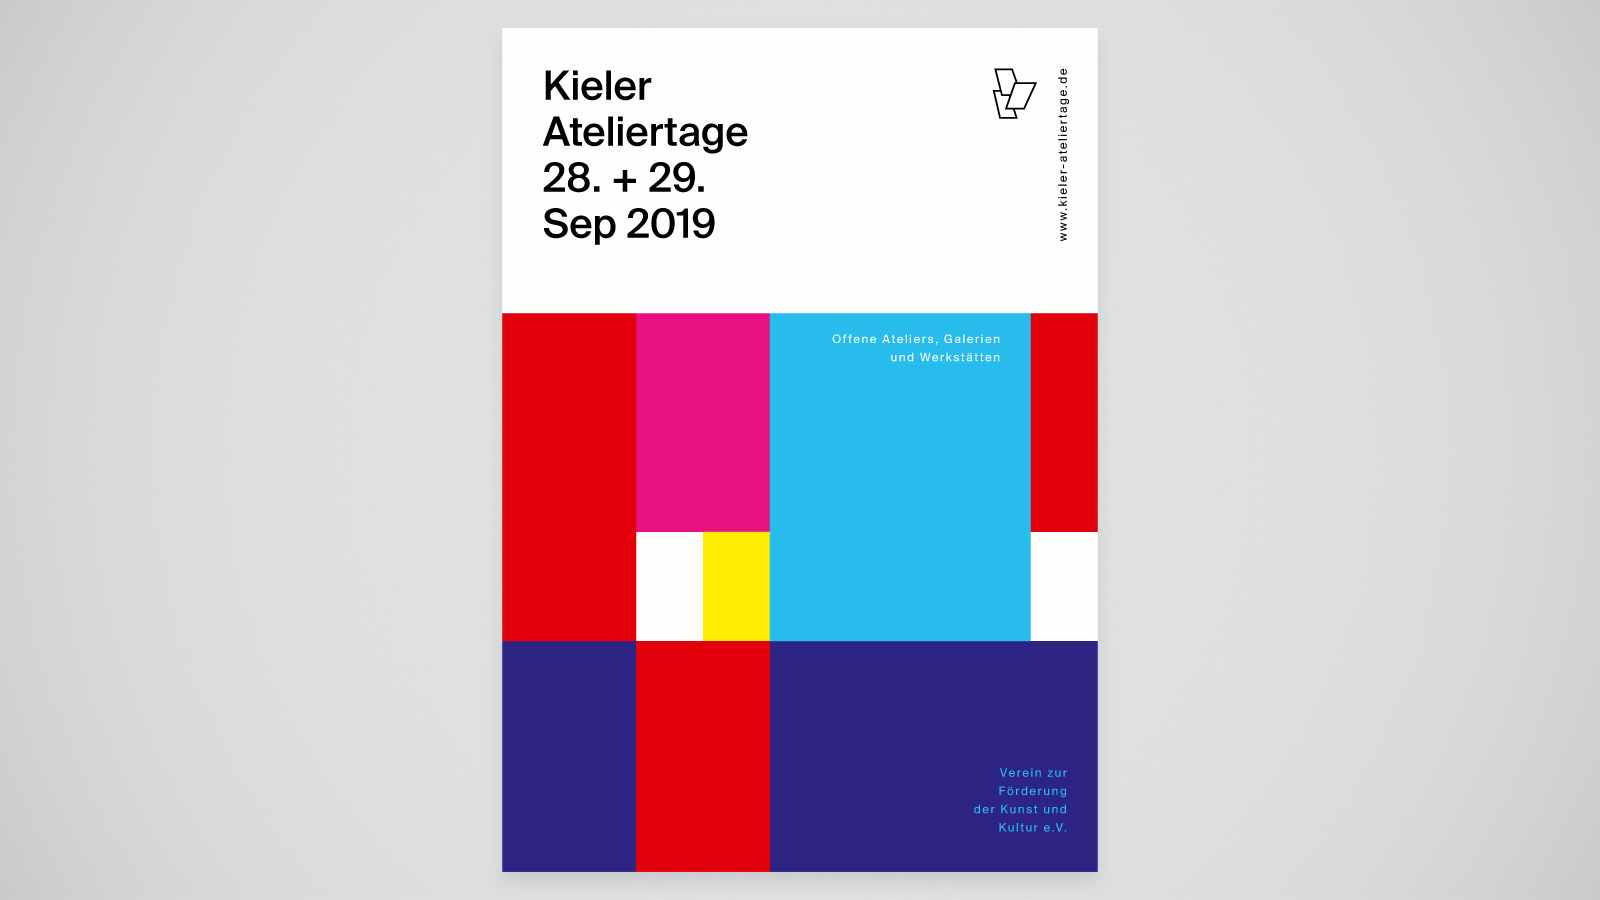 Kieler Ateliertage